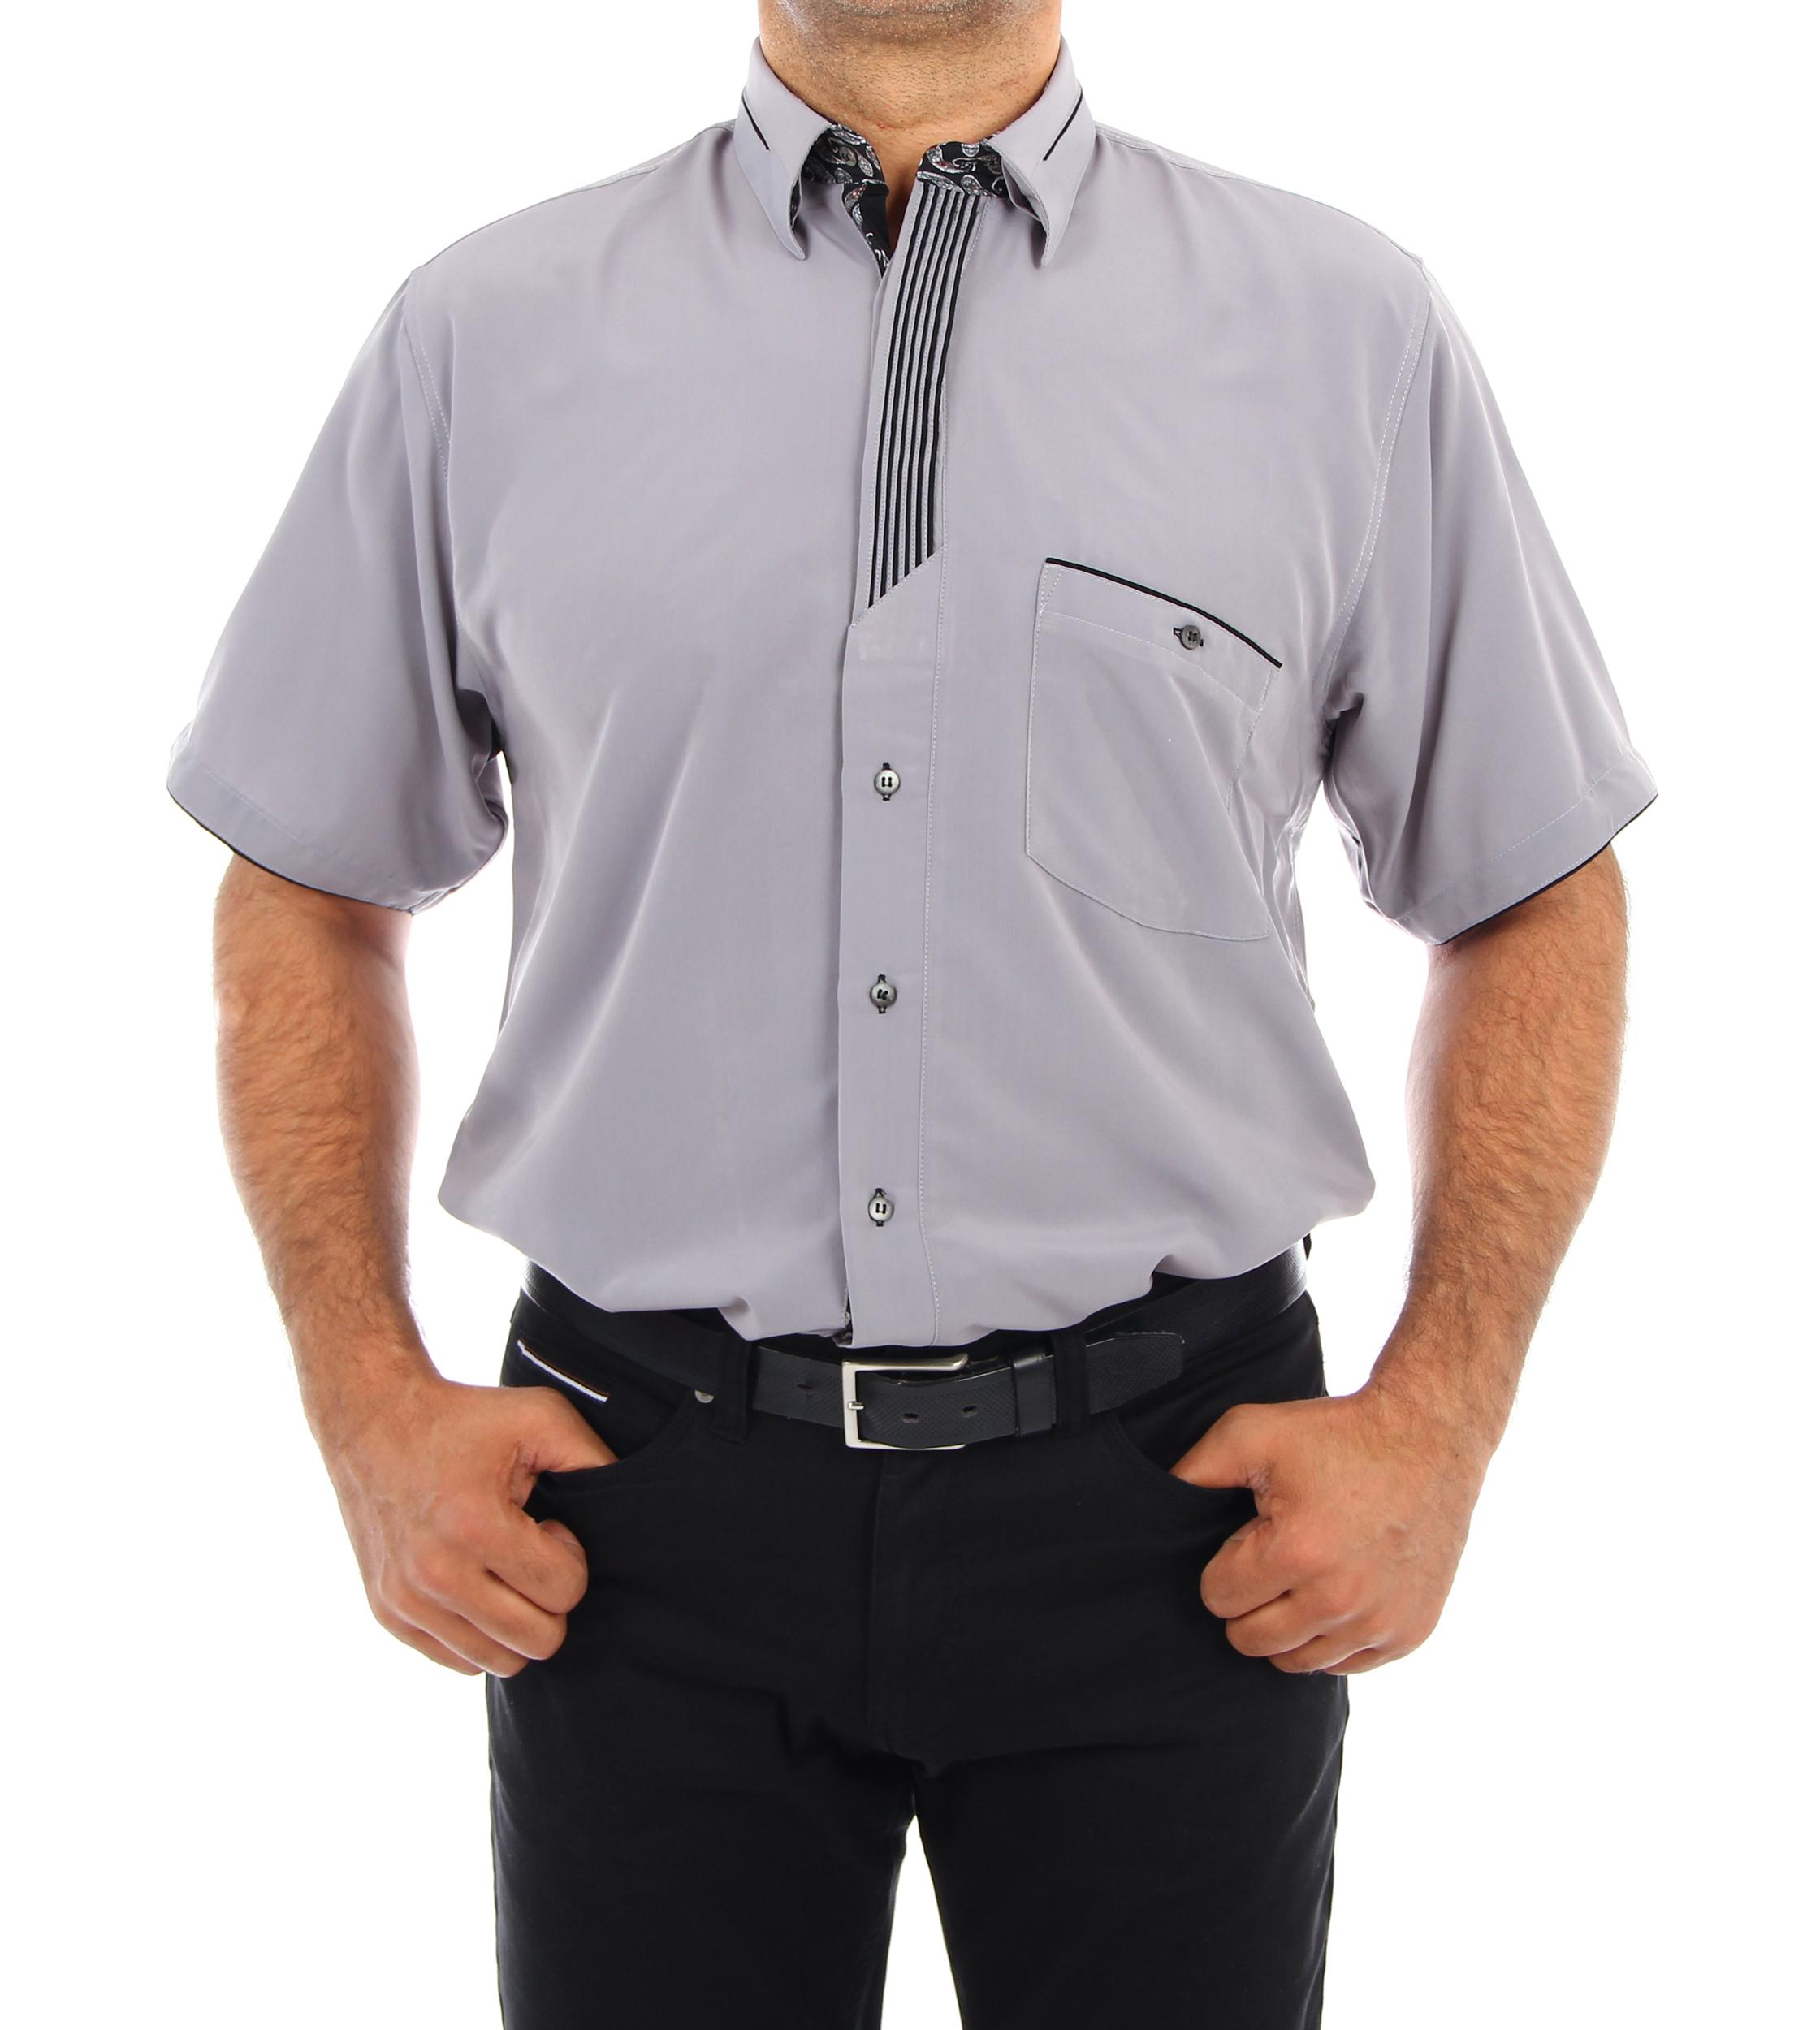 ad71f3e1b75c9b H.K. Mandel Kreative Mode für Männer - Special Shirt.Special Hemd ...